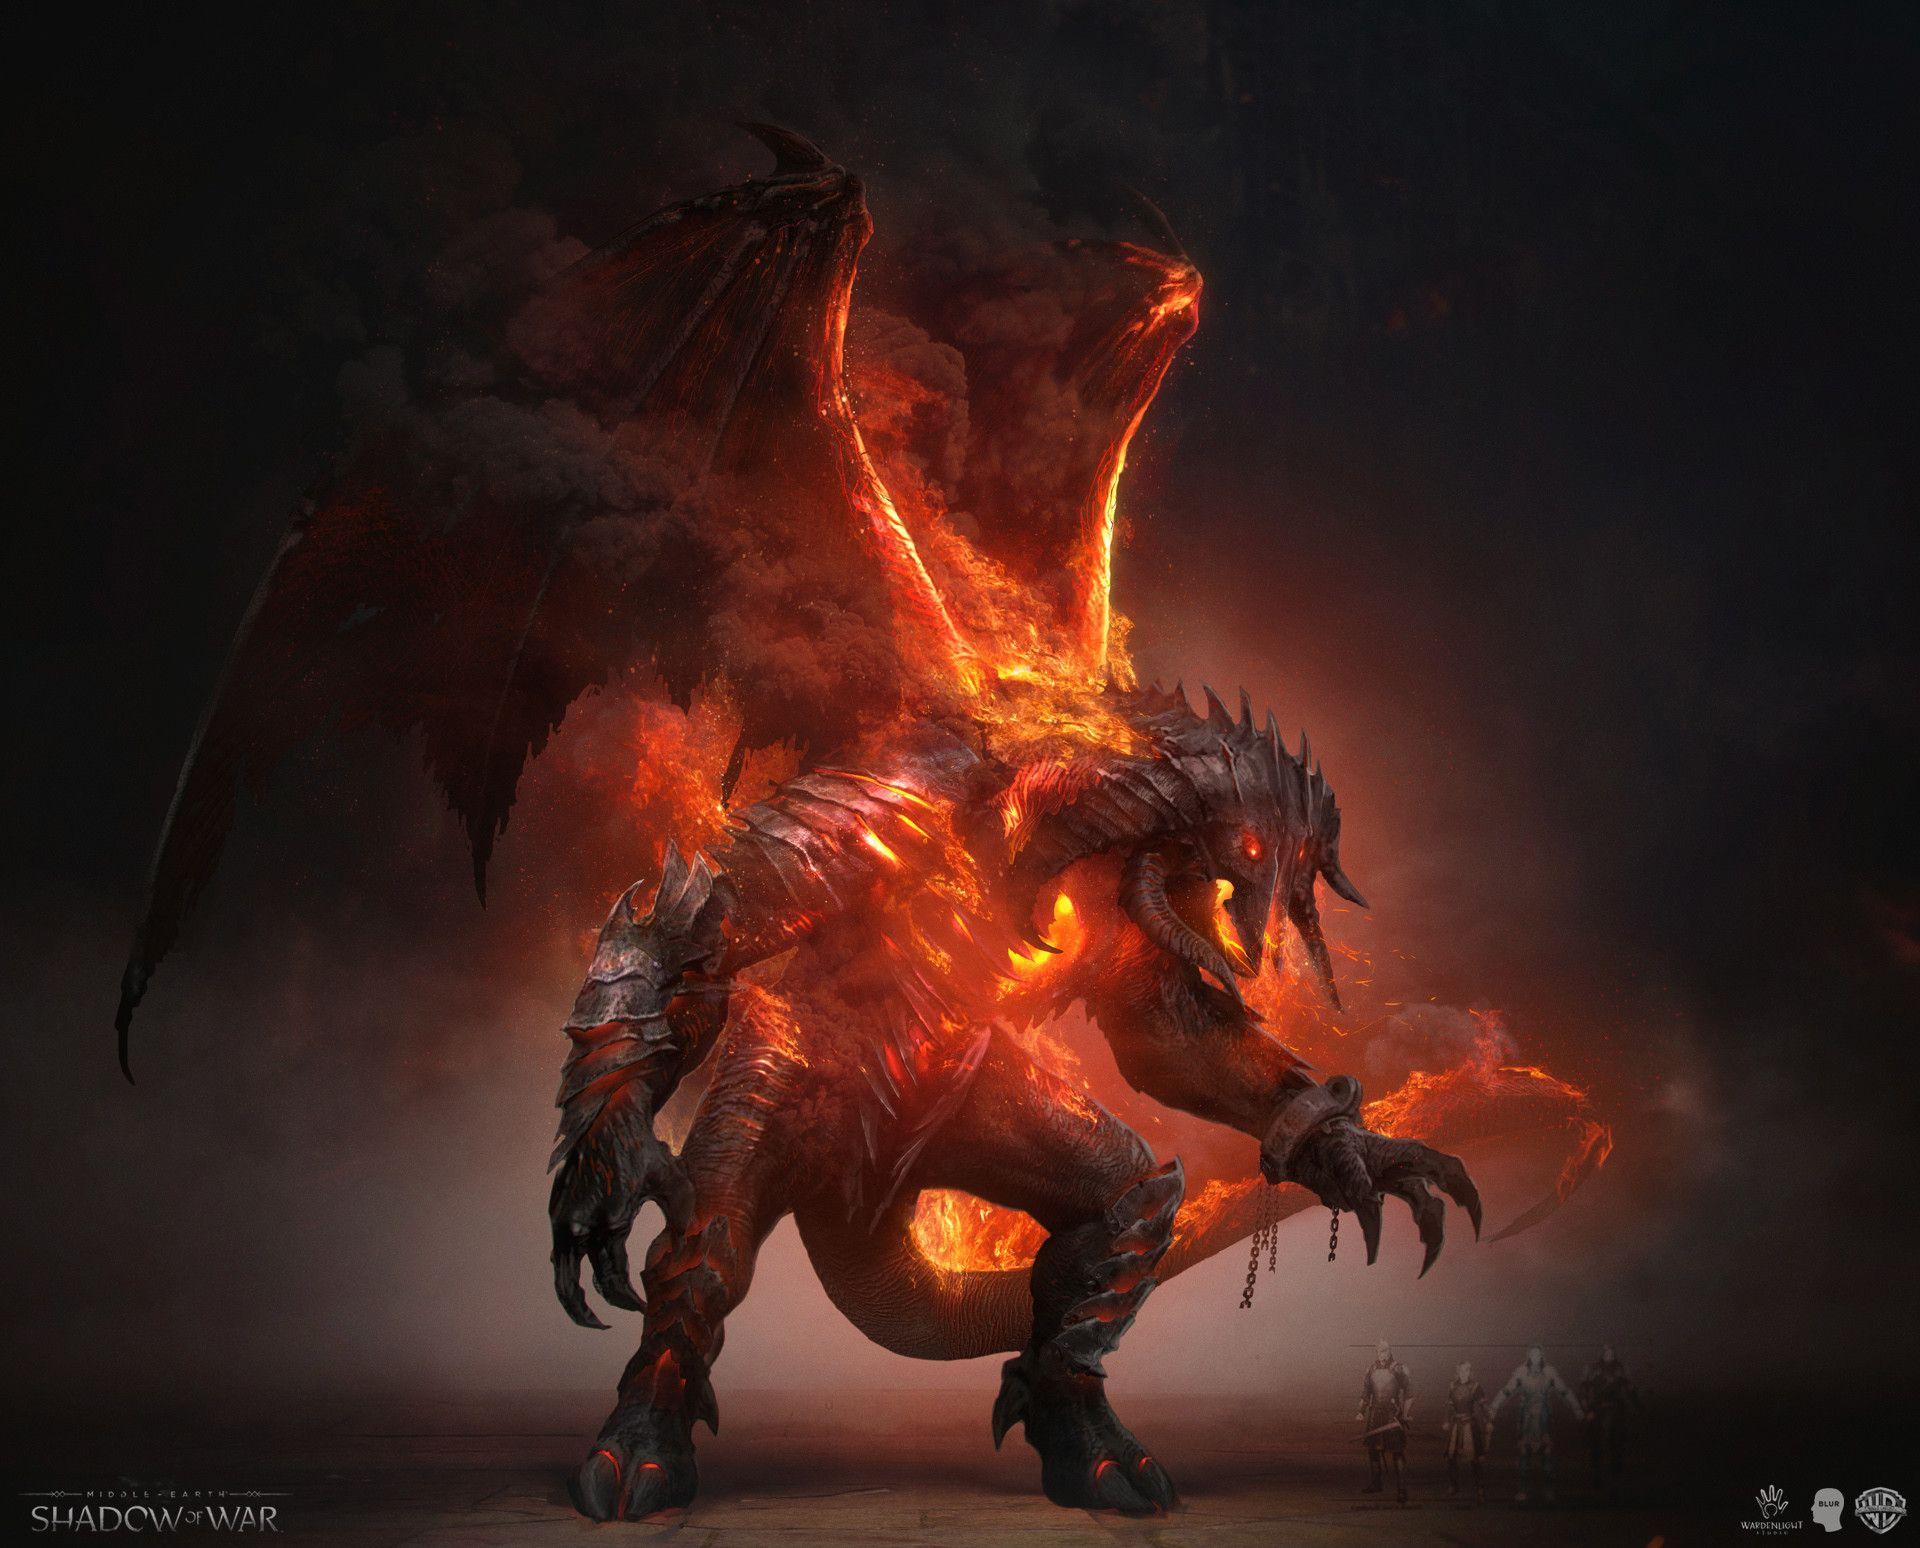 Wardenlight Studio Wardenlight Blur Shadow Of War Balrogfx02 Jpg 1 920 1 548 Pixels Balrog Shadow Of Mordor Middle Earth Art